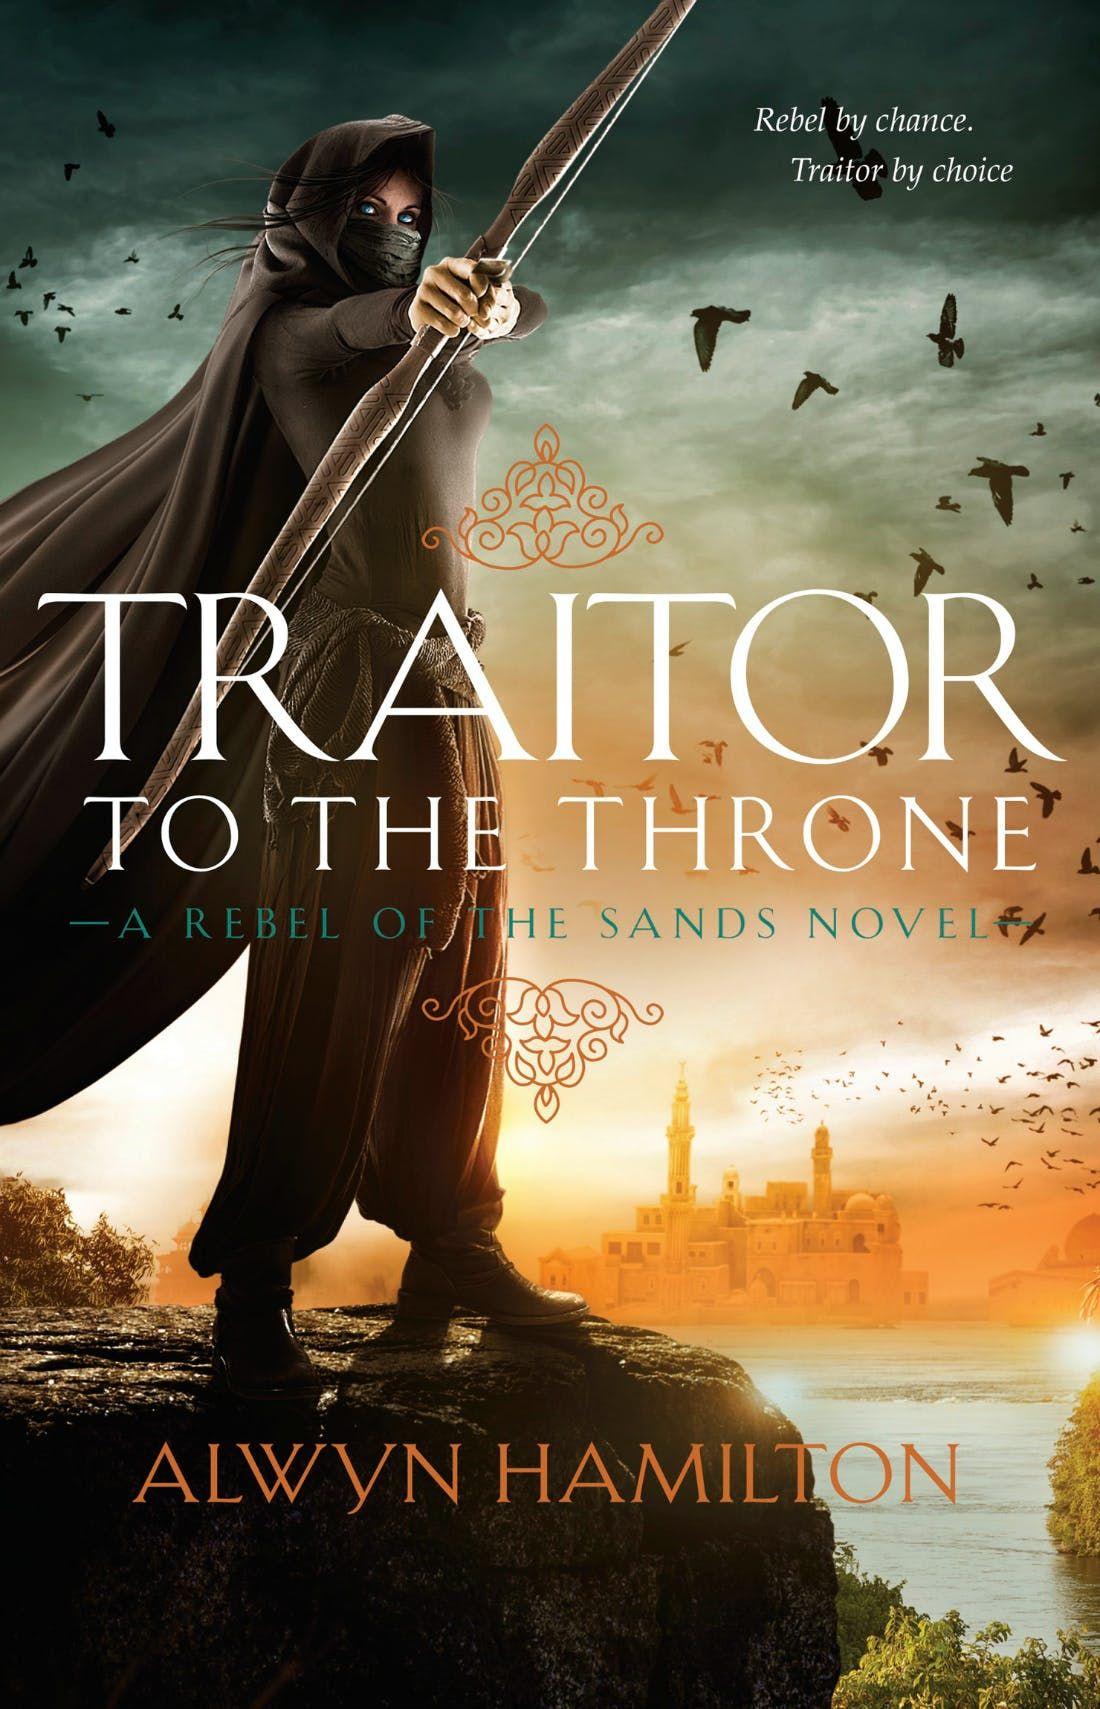 Download pdf traitor to the throne by alwyn hamilton free download pdf traitor to the throne by alwyn hamilton fandeluxe Gallery